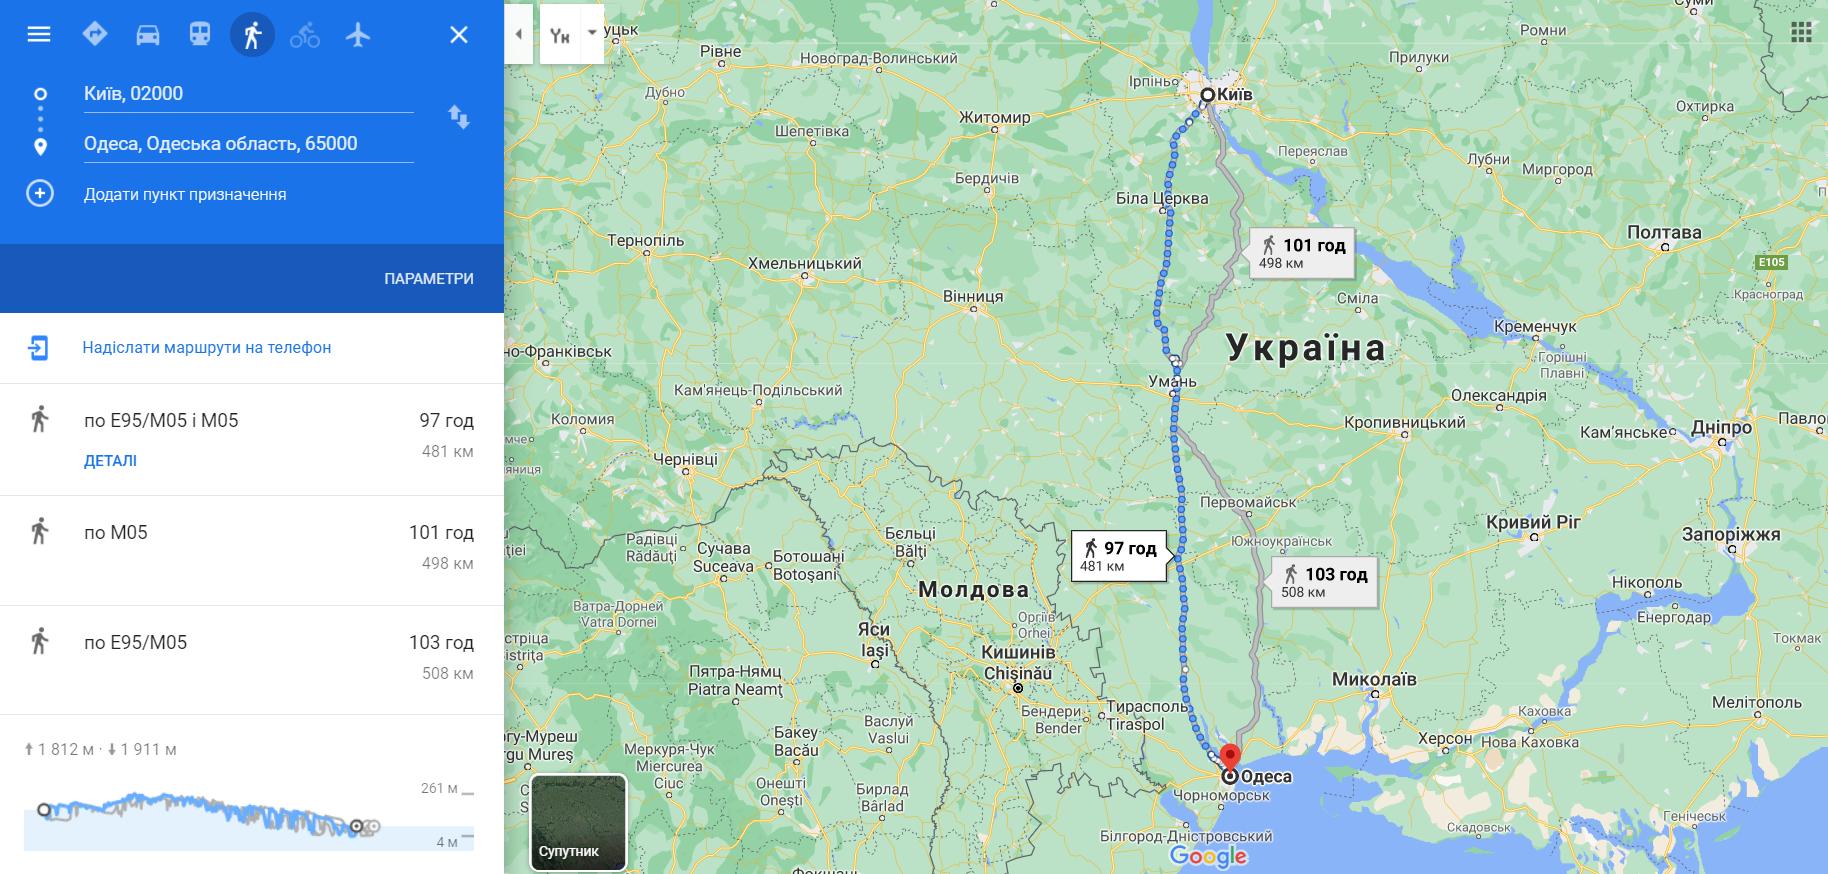 Маршрту з Києва до Одеси